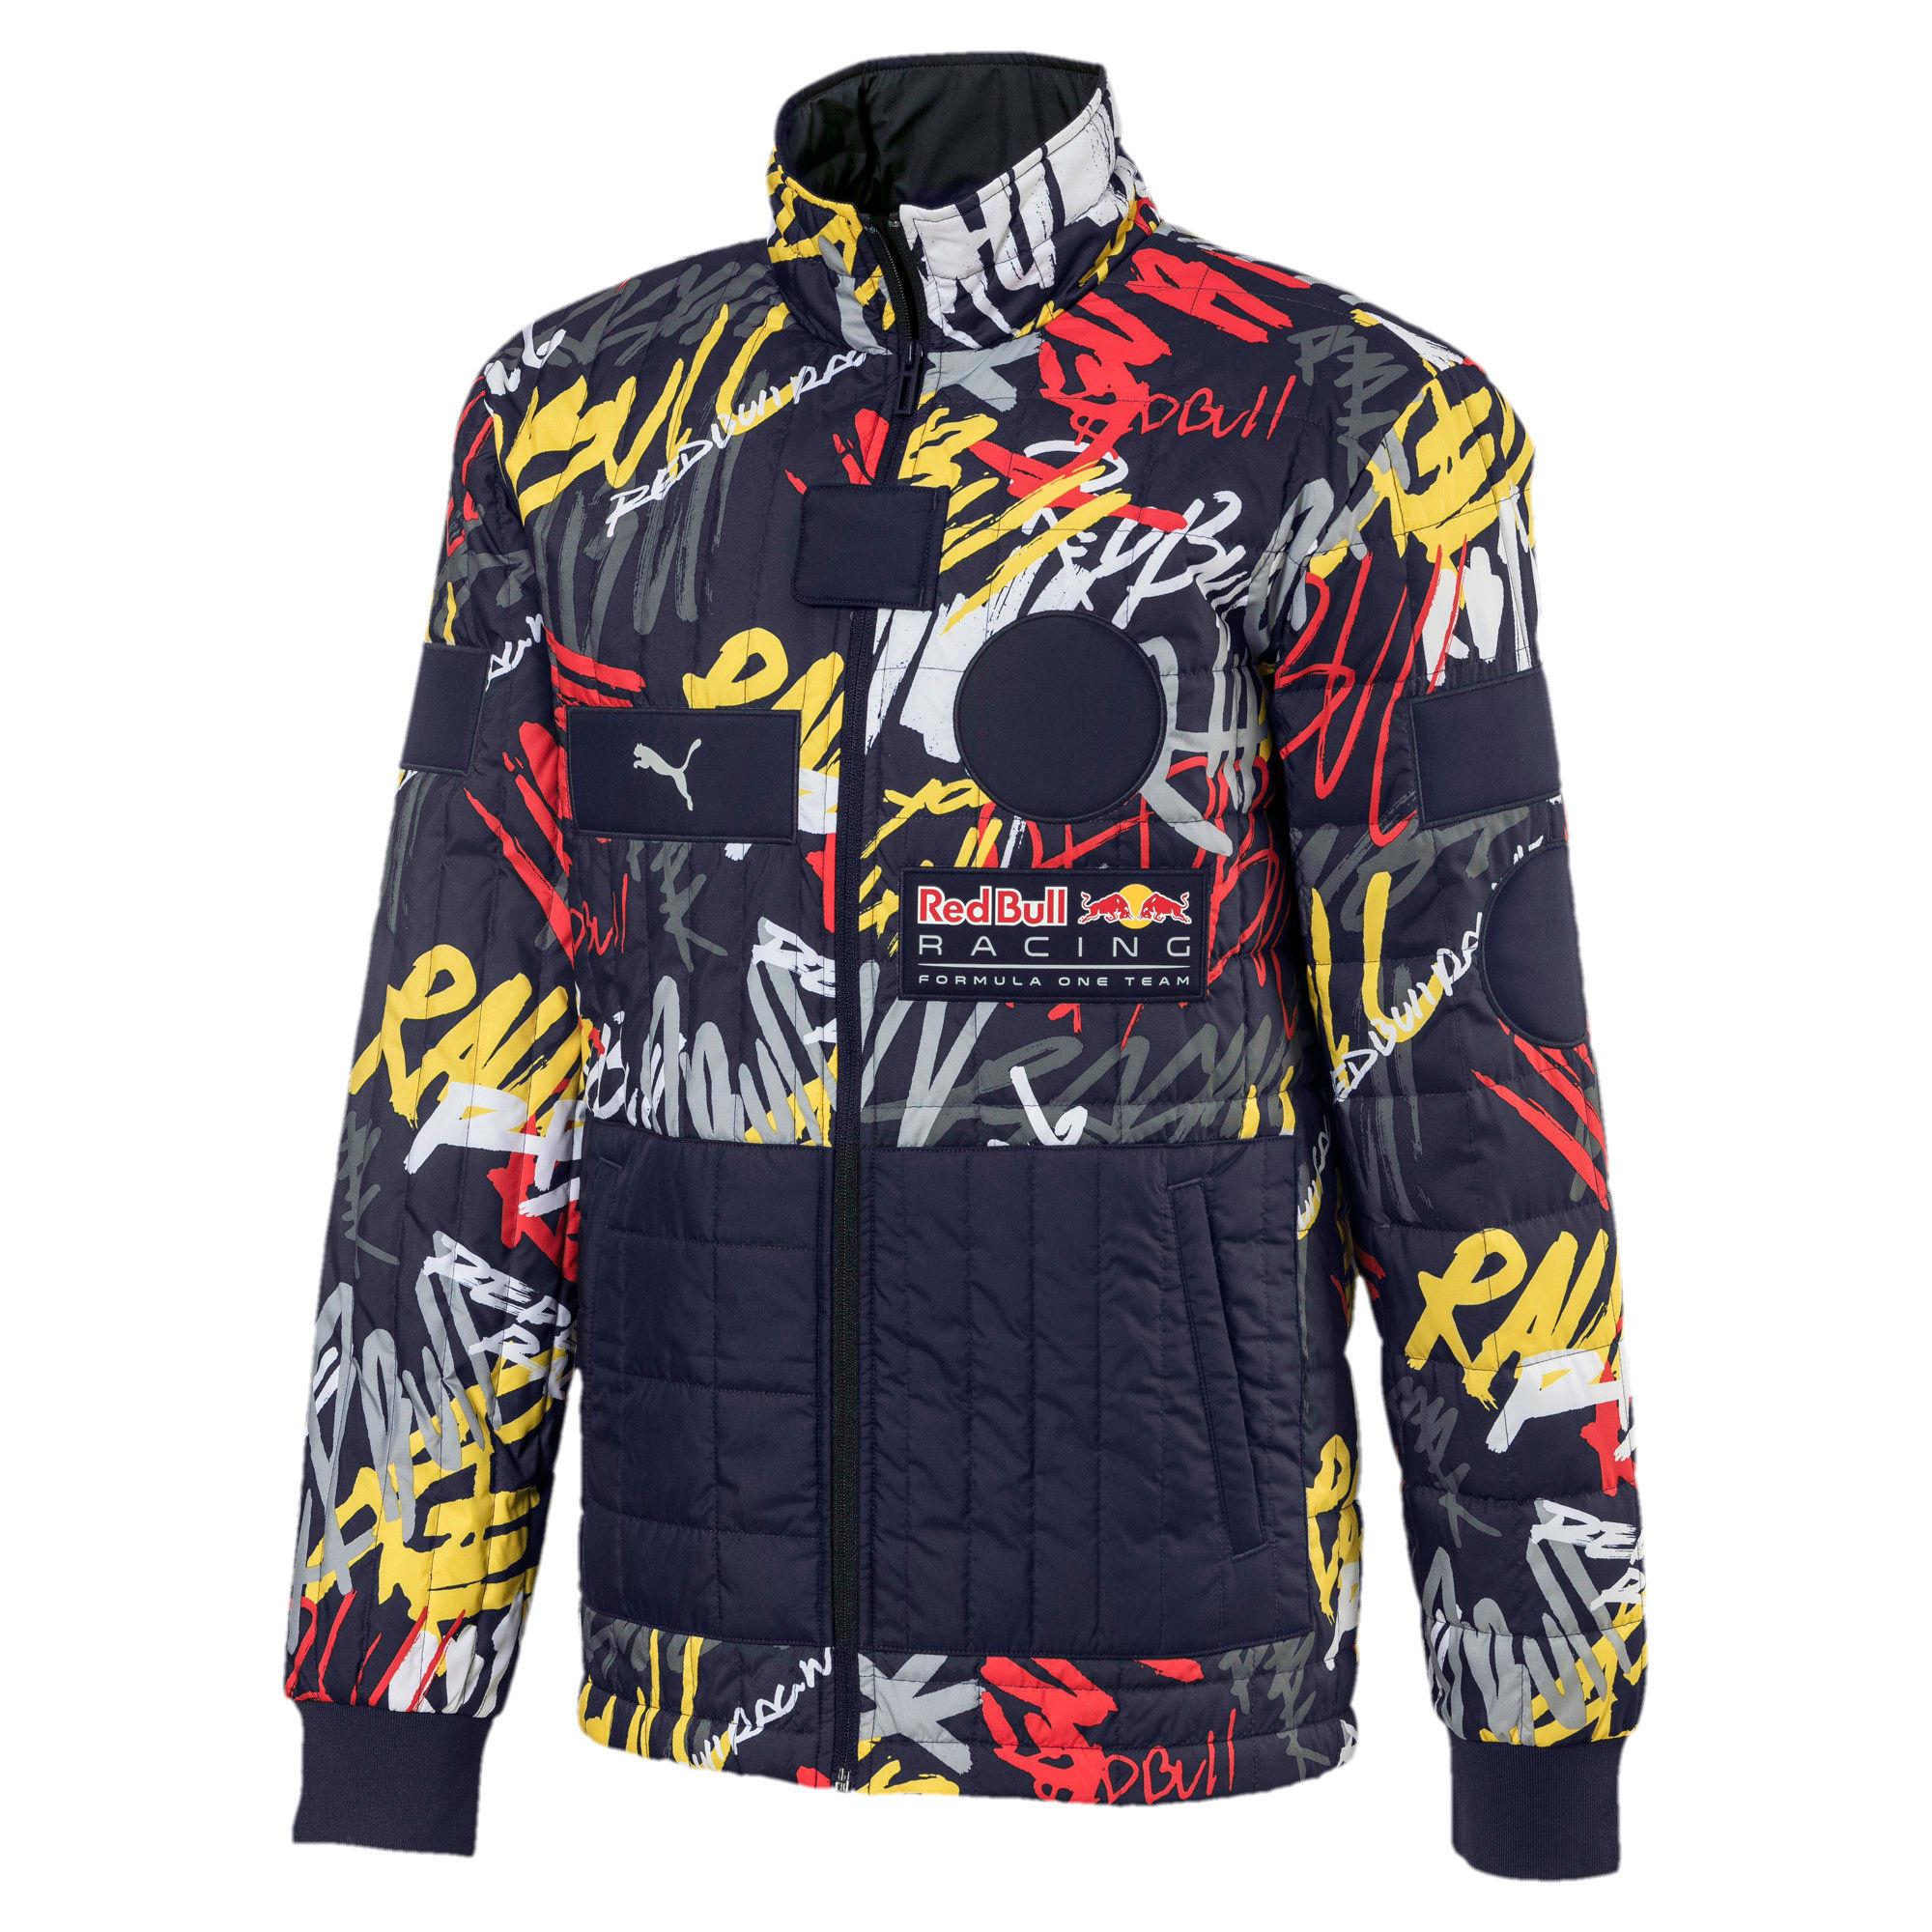 Thumbnail 1 of Red Bull Racing Street Men's Jacket, NIGHT SKY, medium